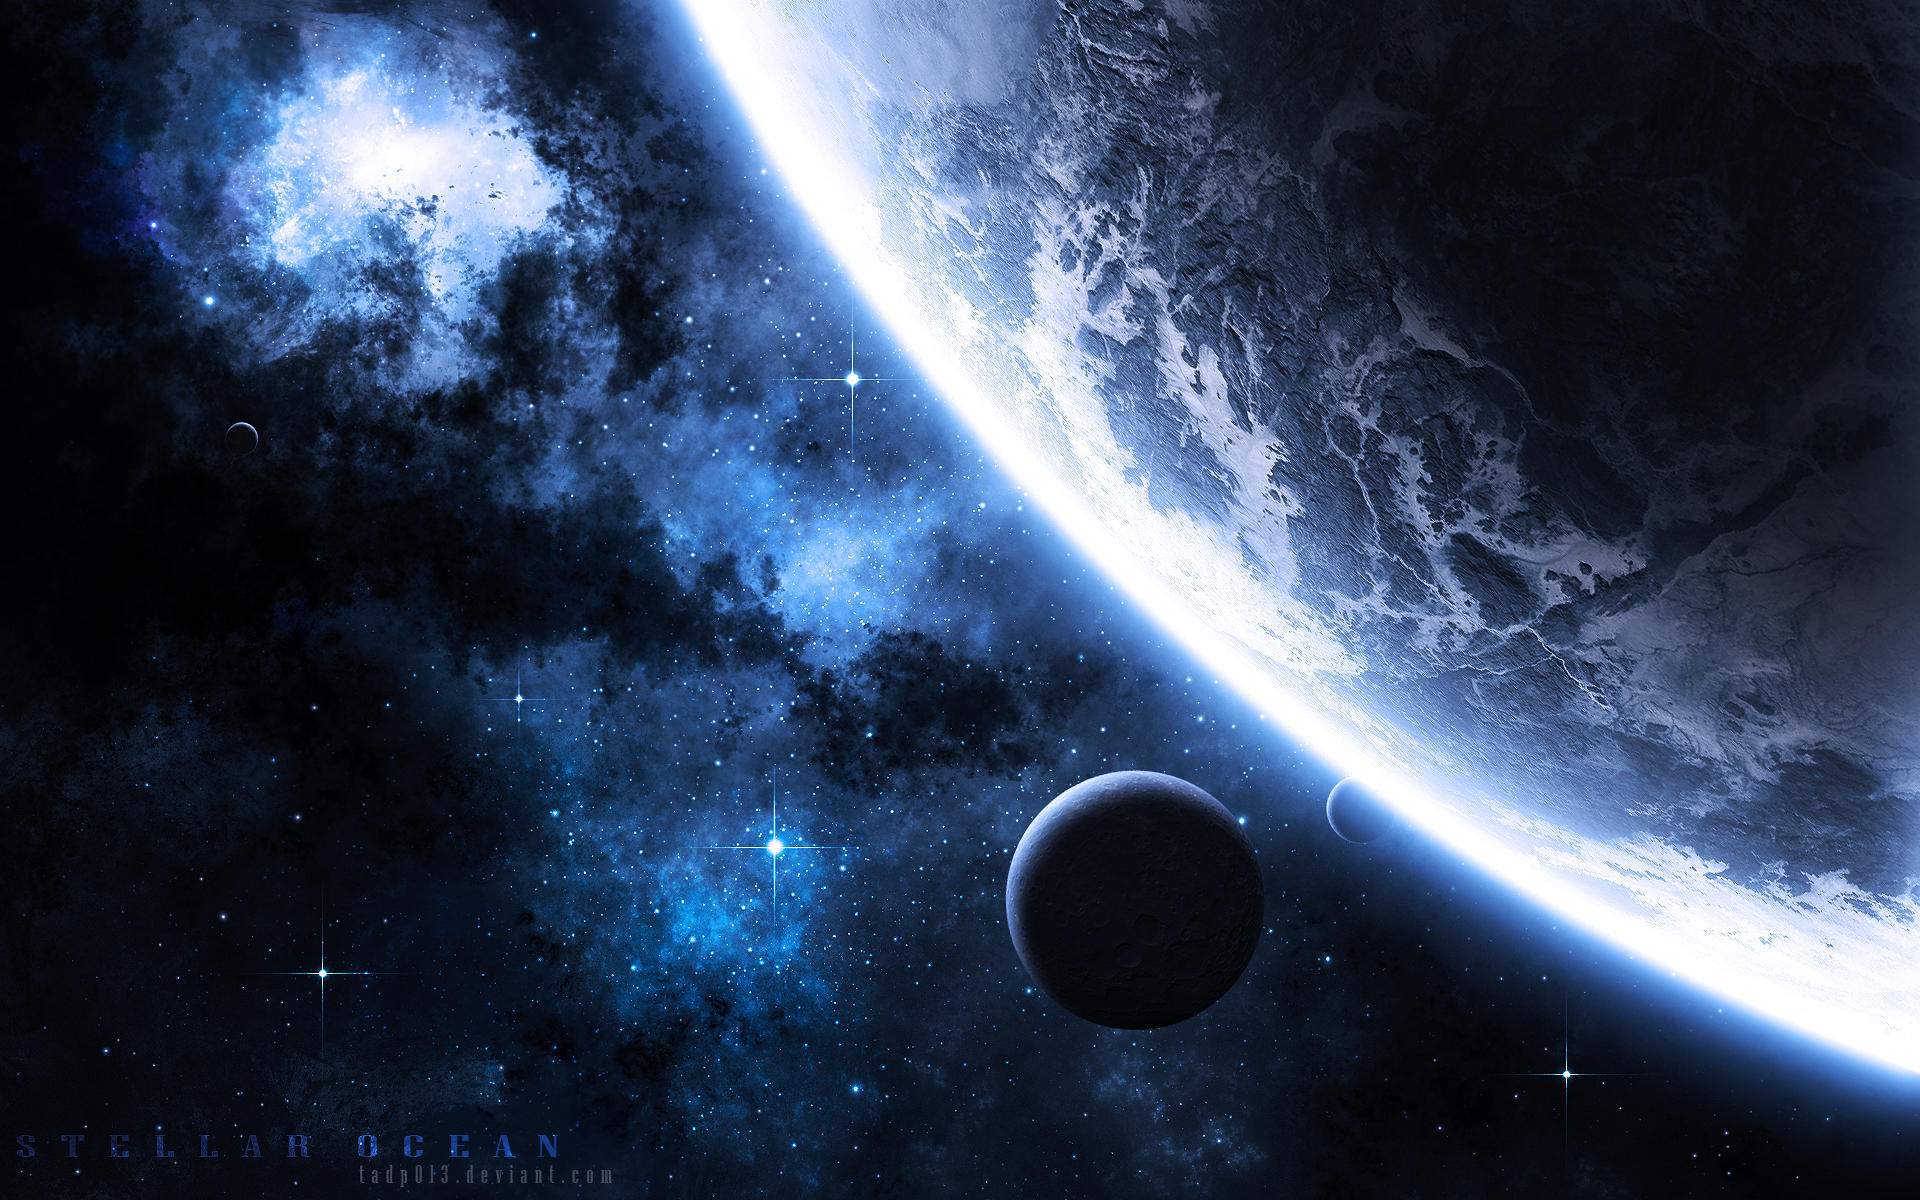 Stellar Ocean by tadp0l3